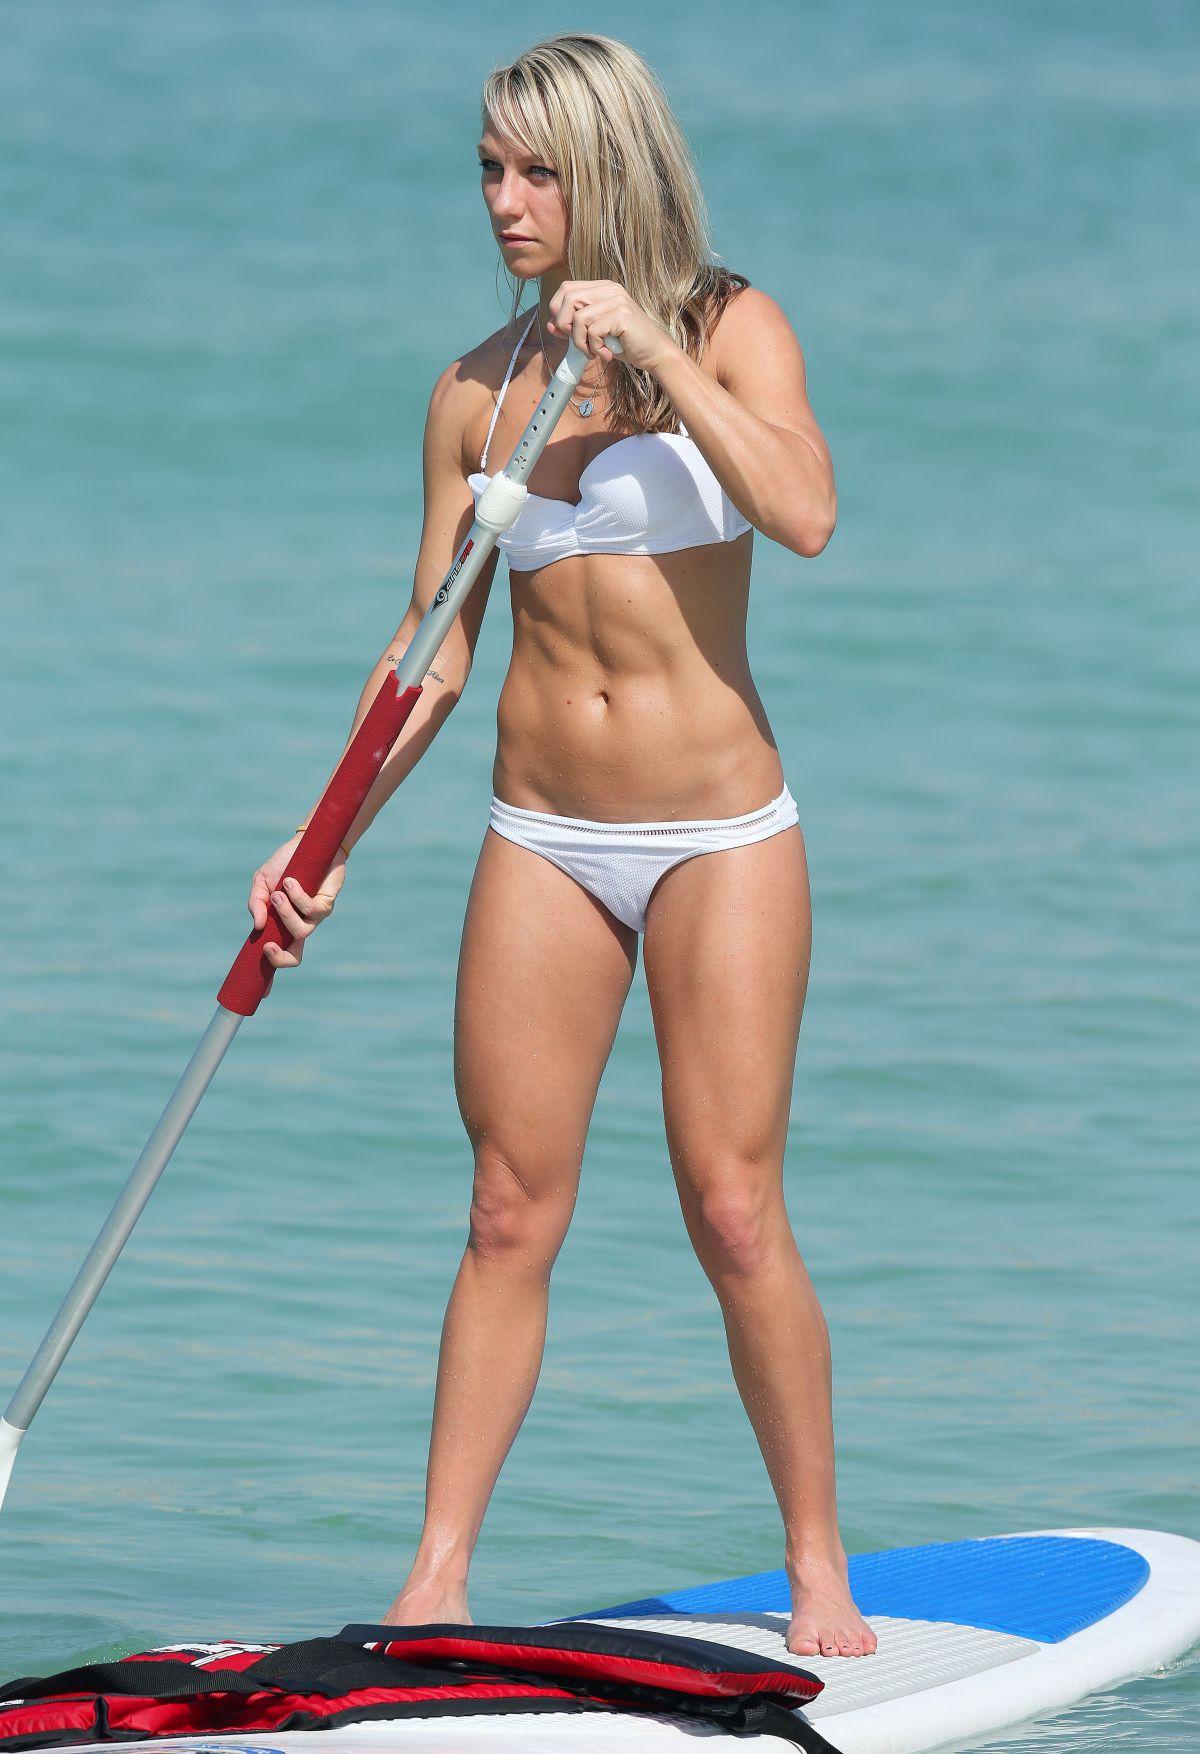 Watch Chloe madeley bikini video